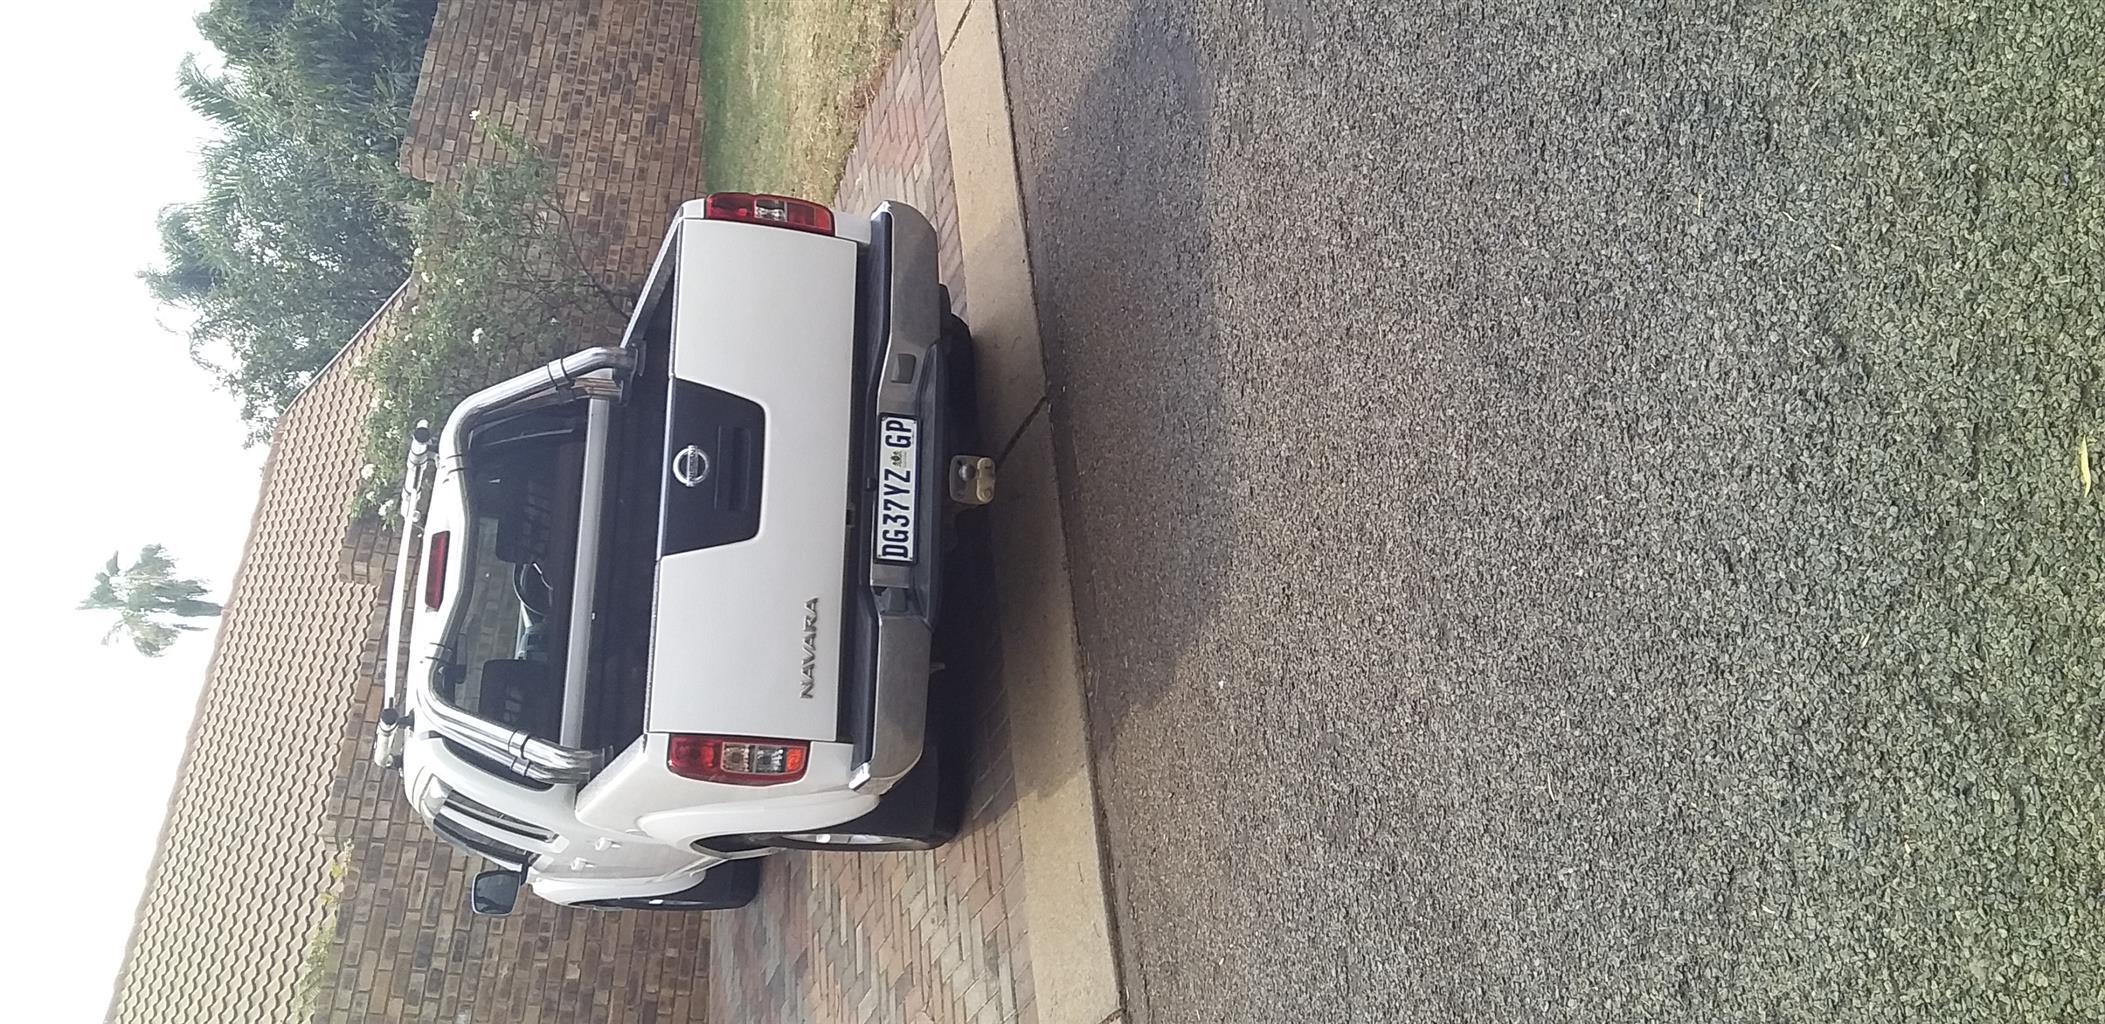 2014 Nissan Navara 2.5dCi double cab 4x4 LE